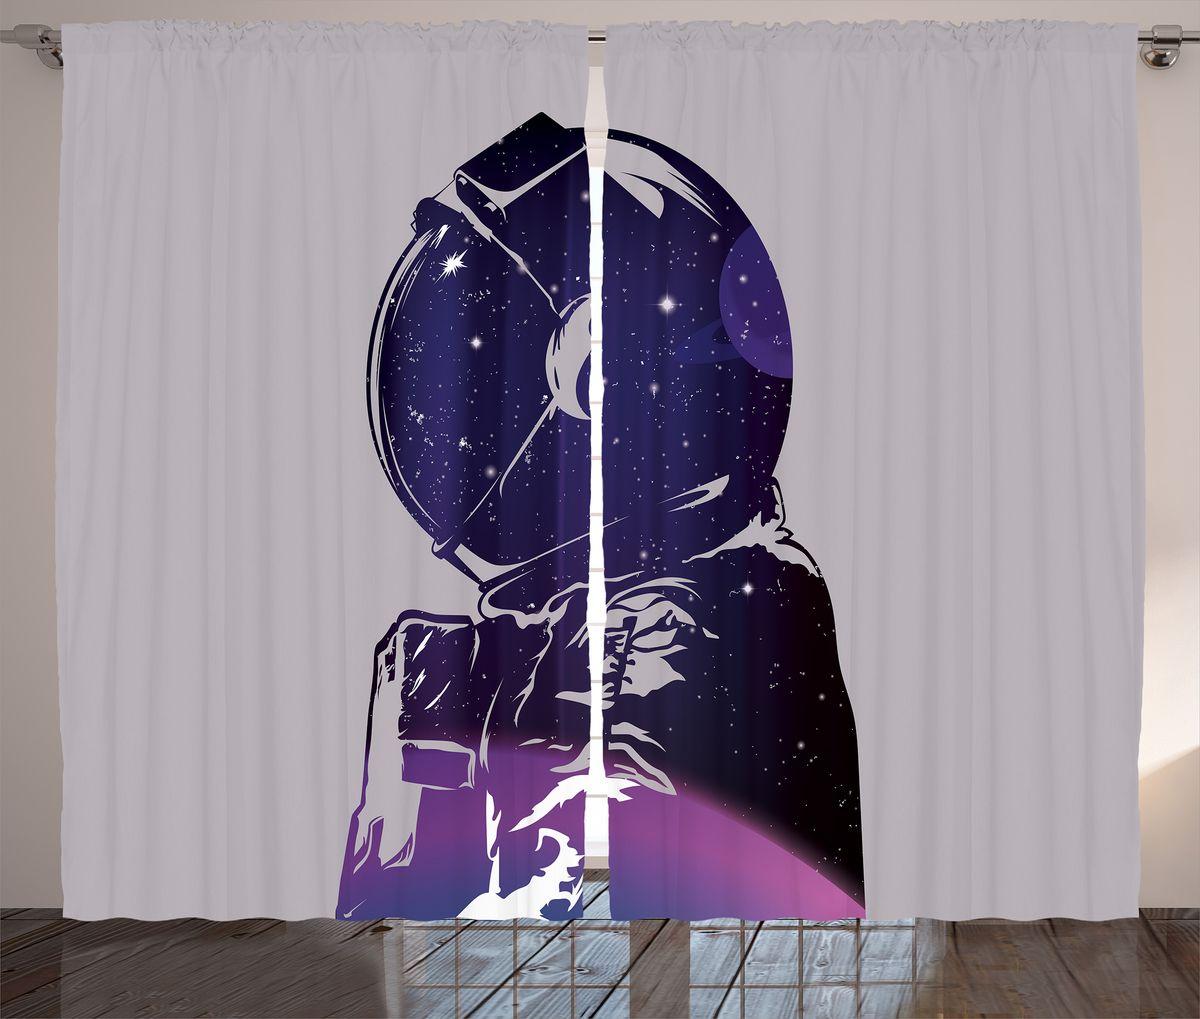 "Комплект фотоштор Magic Lady ""Силуэт космонавта с планетой и звездами"", на ленте, высота 265 см. шсг_19938"